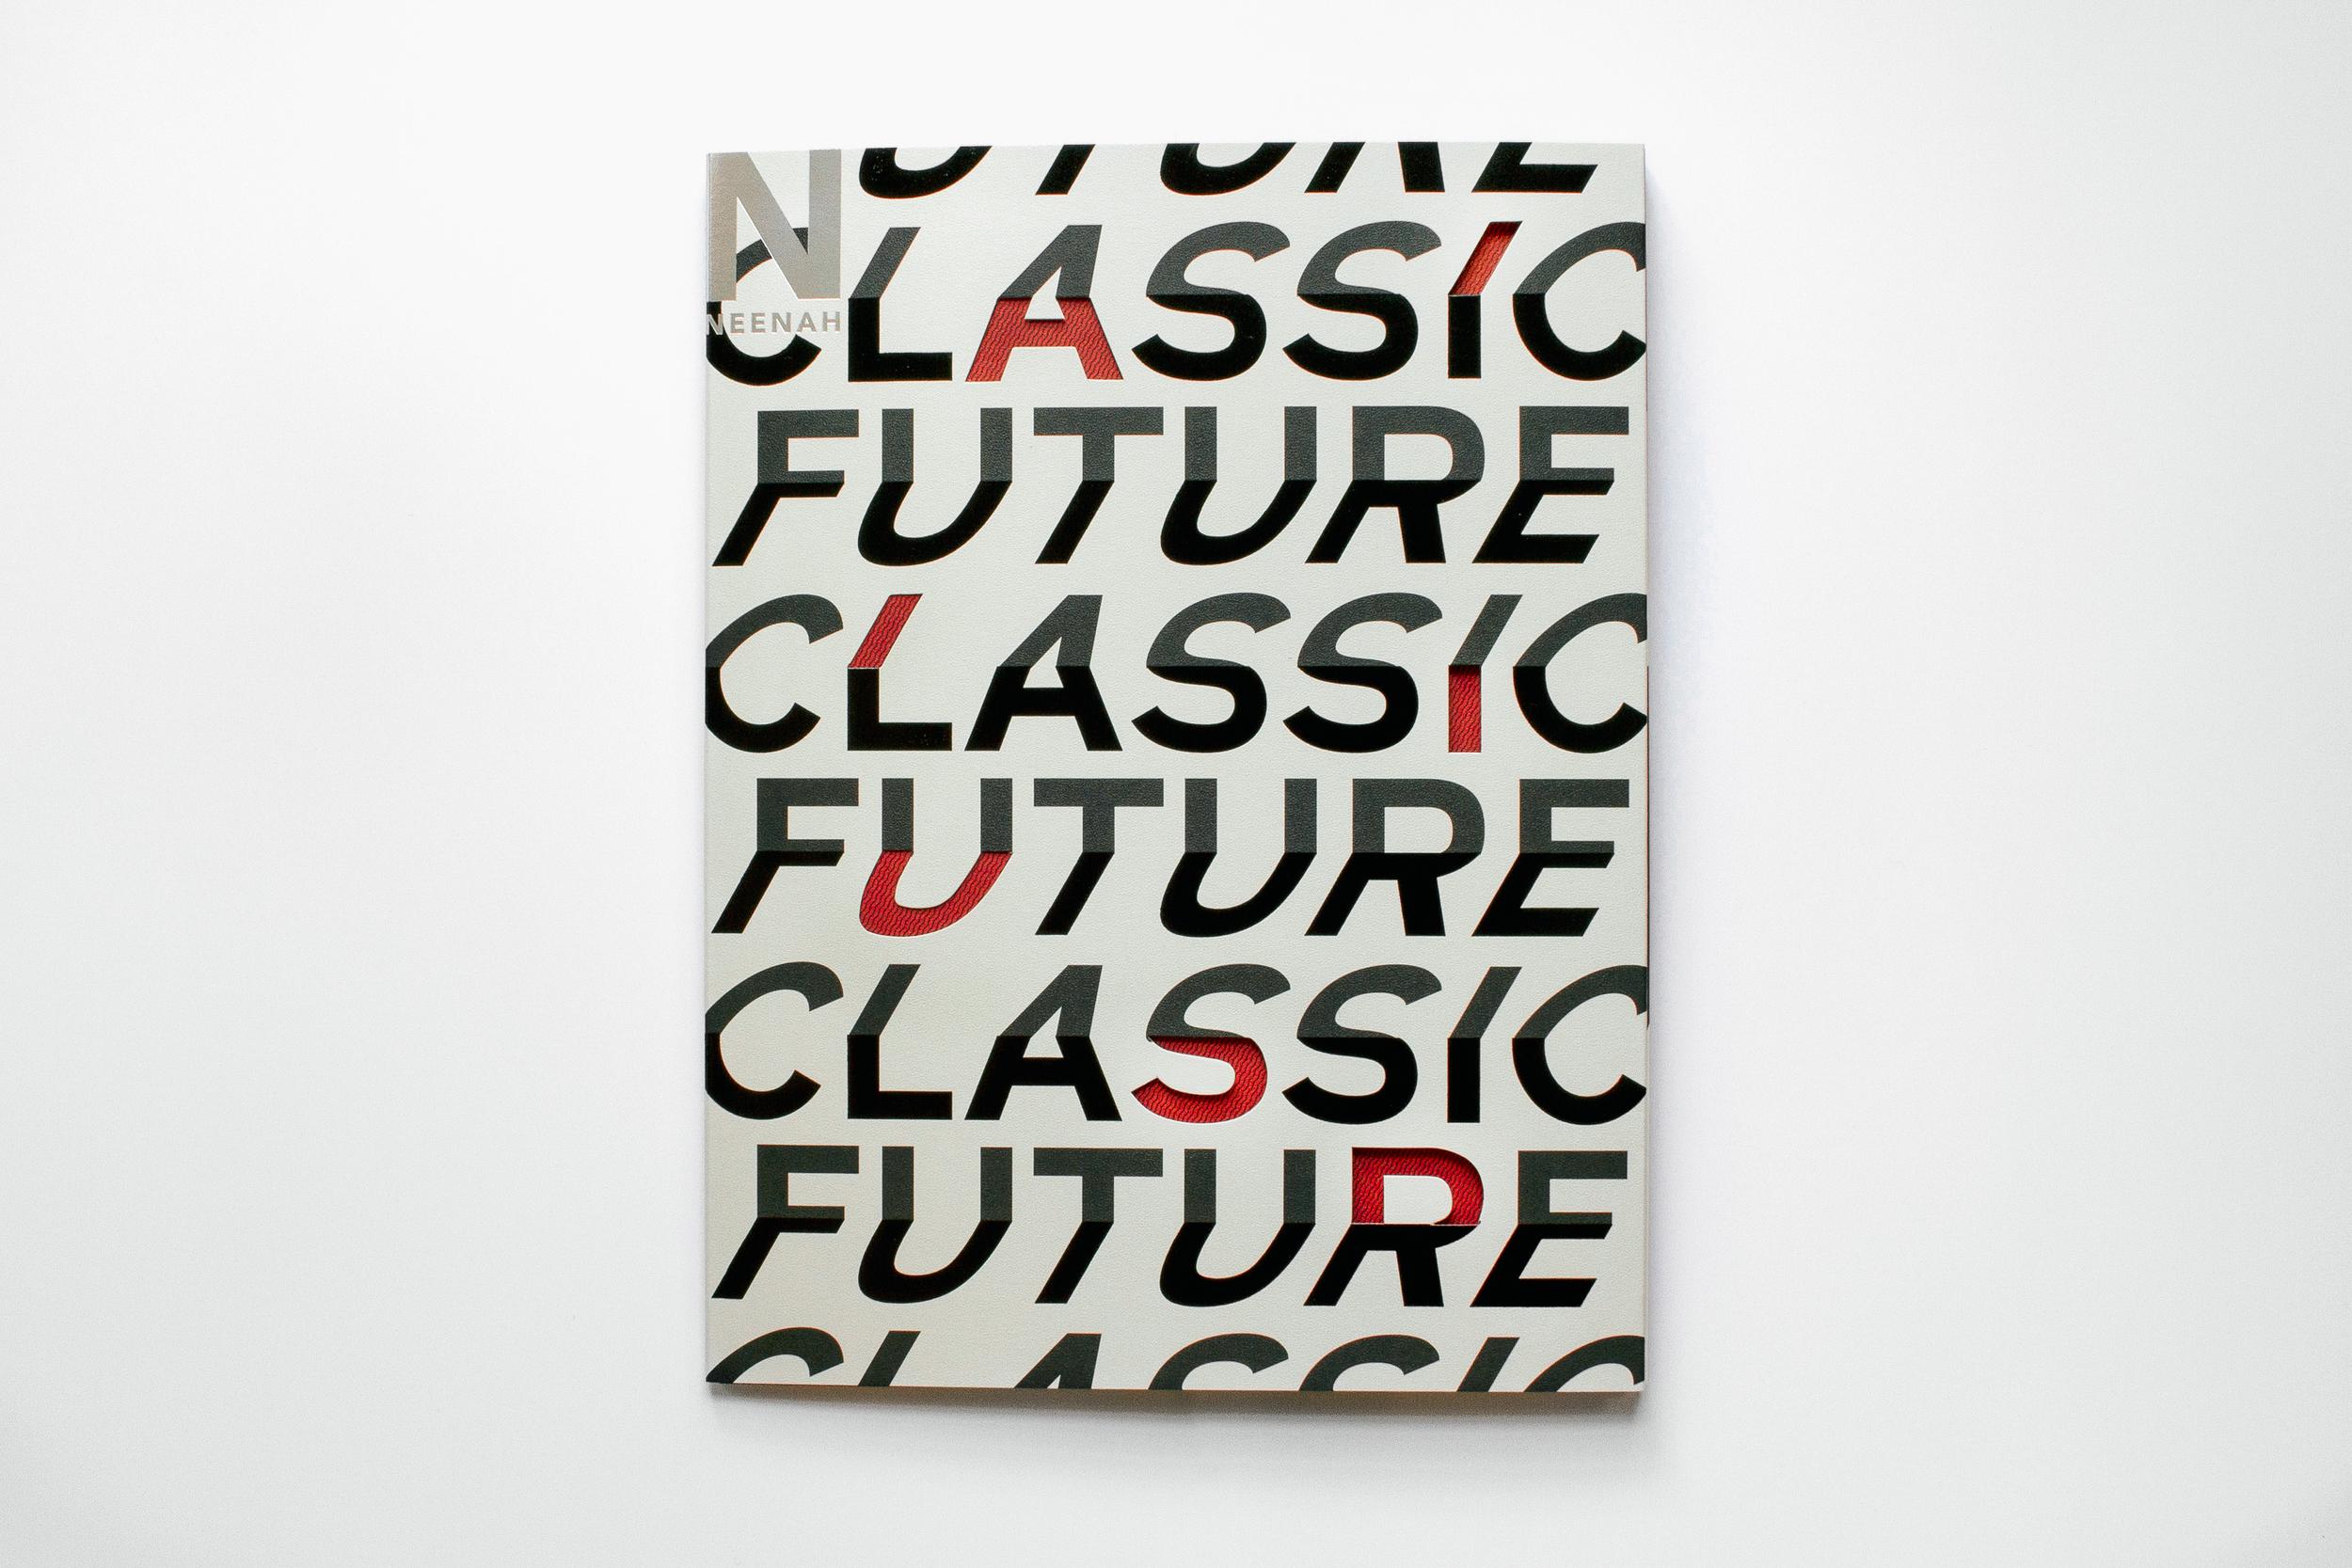 neenah paper classic future cover